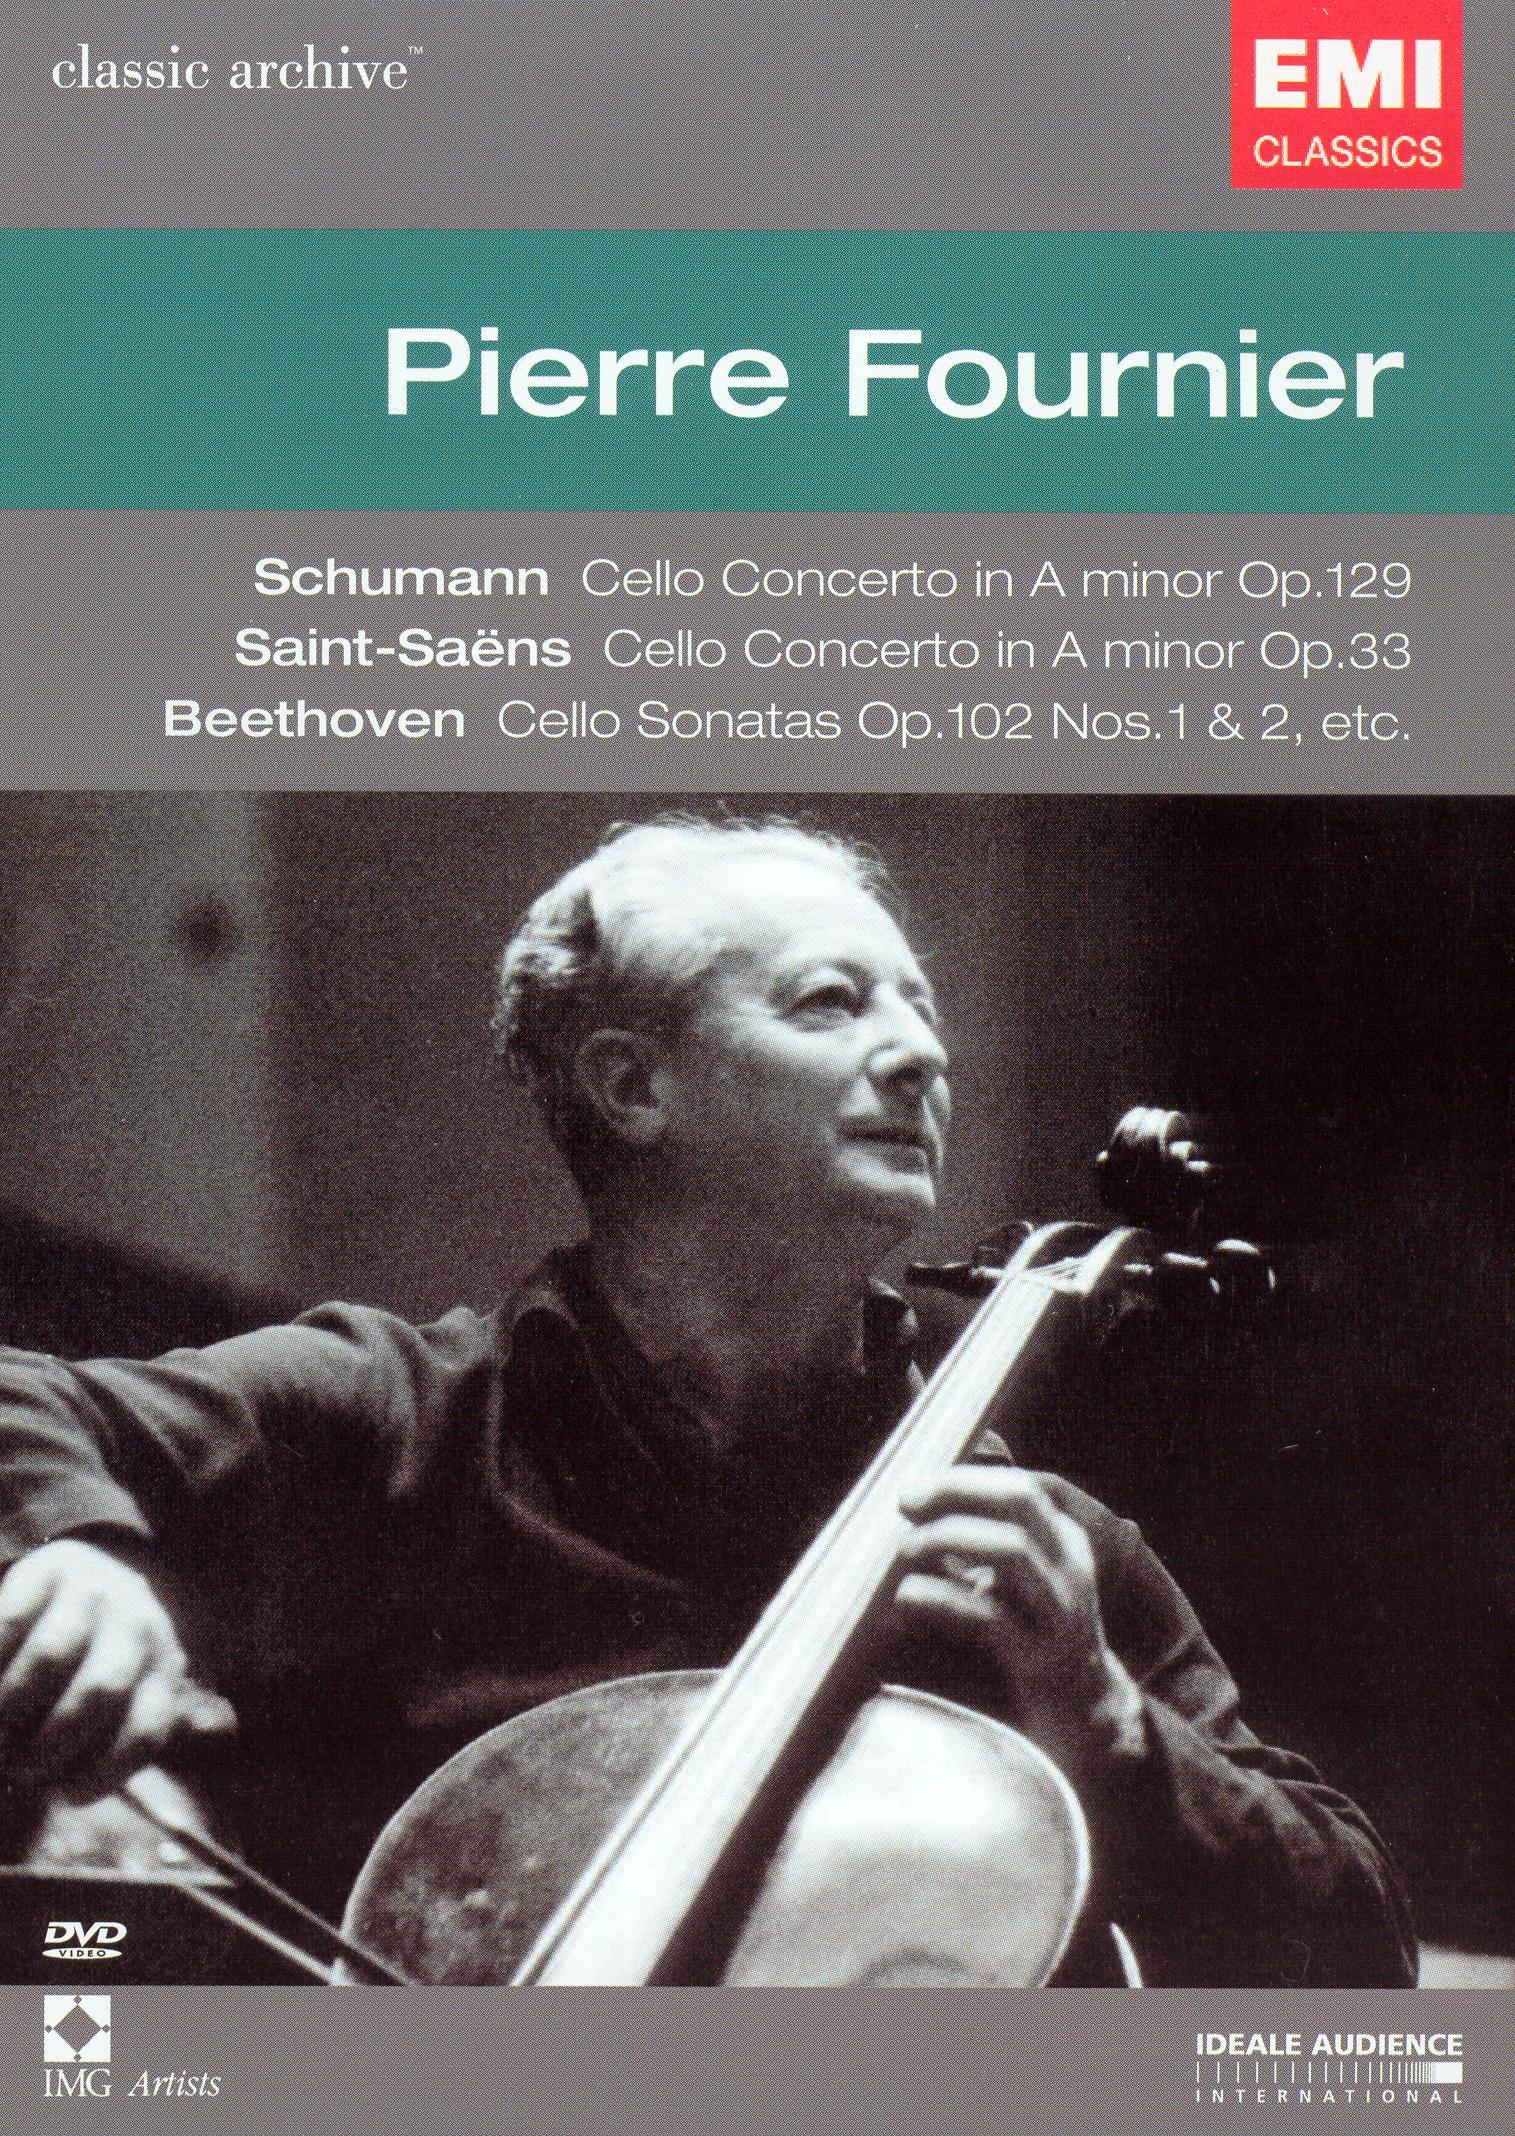 Classic Archive: Schumann/Saint-Saens/Beethoven/Fournier